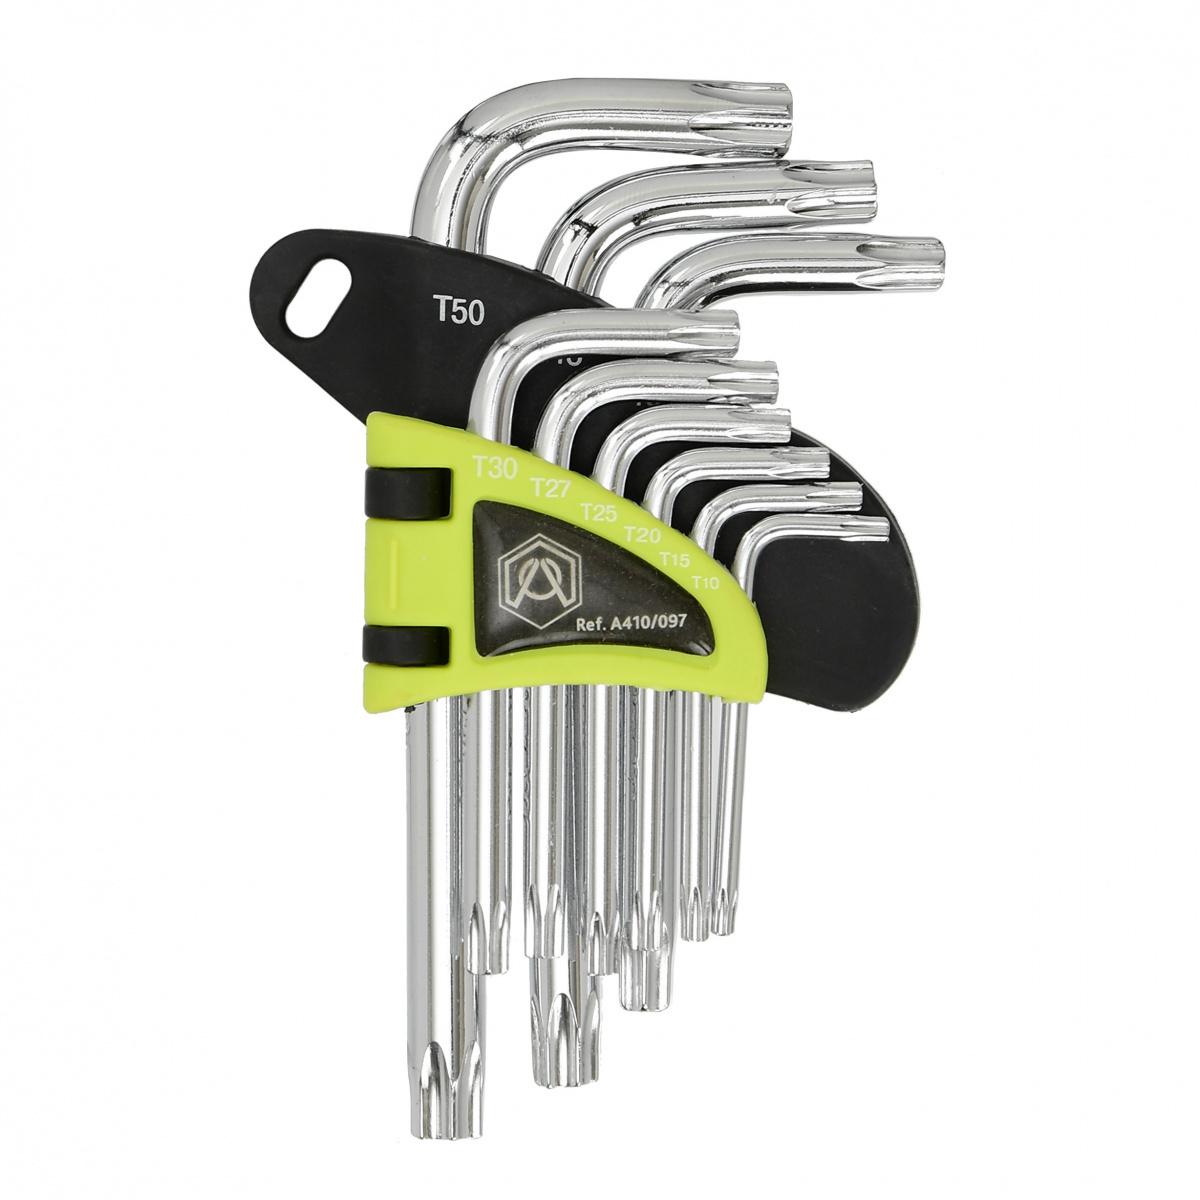 Набор ключей Torx A410/097, короткие